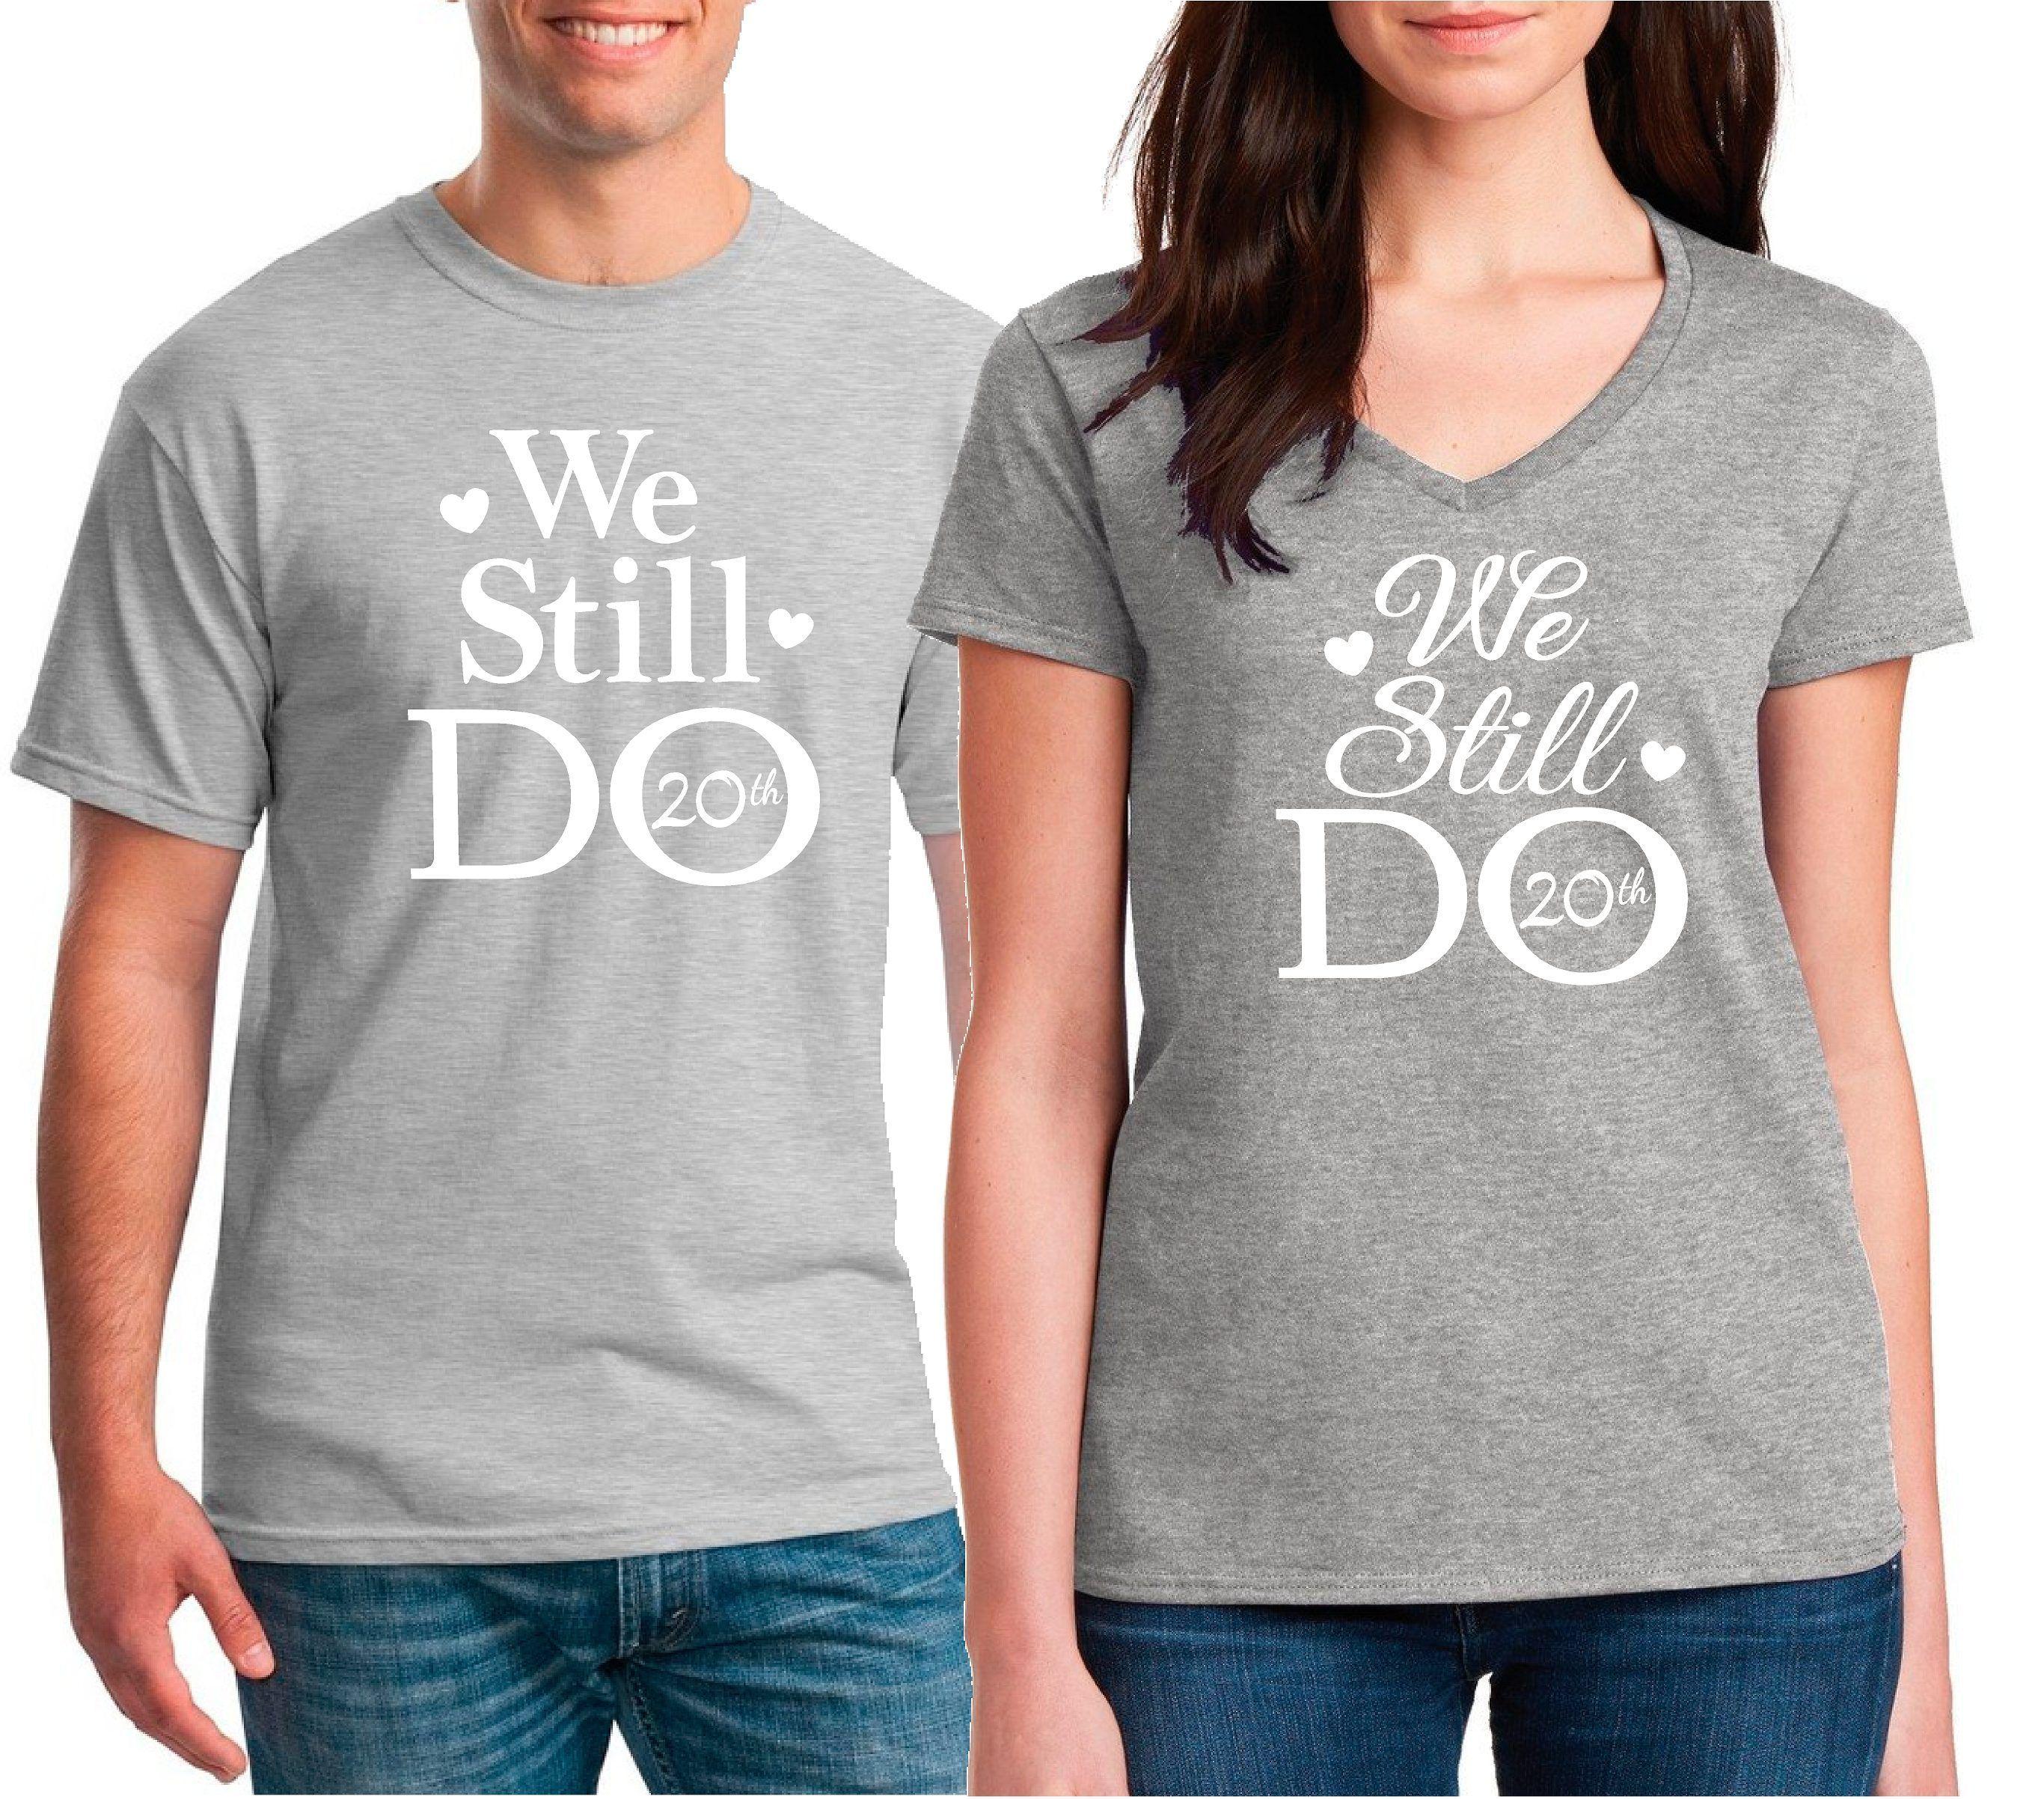 Wedding Anniversary T Shirts Our T Shirt Shack Couple Shirts Anniversary Shirt 40th Anniversary Shirts